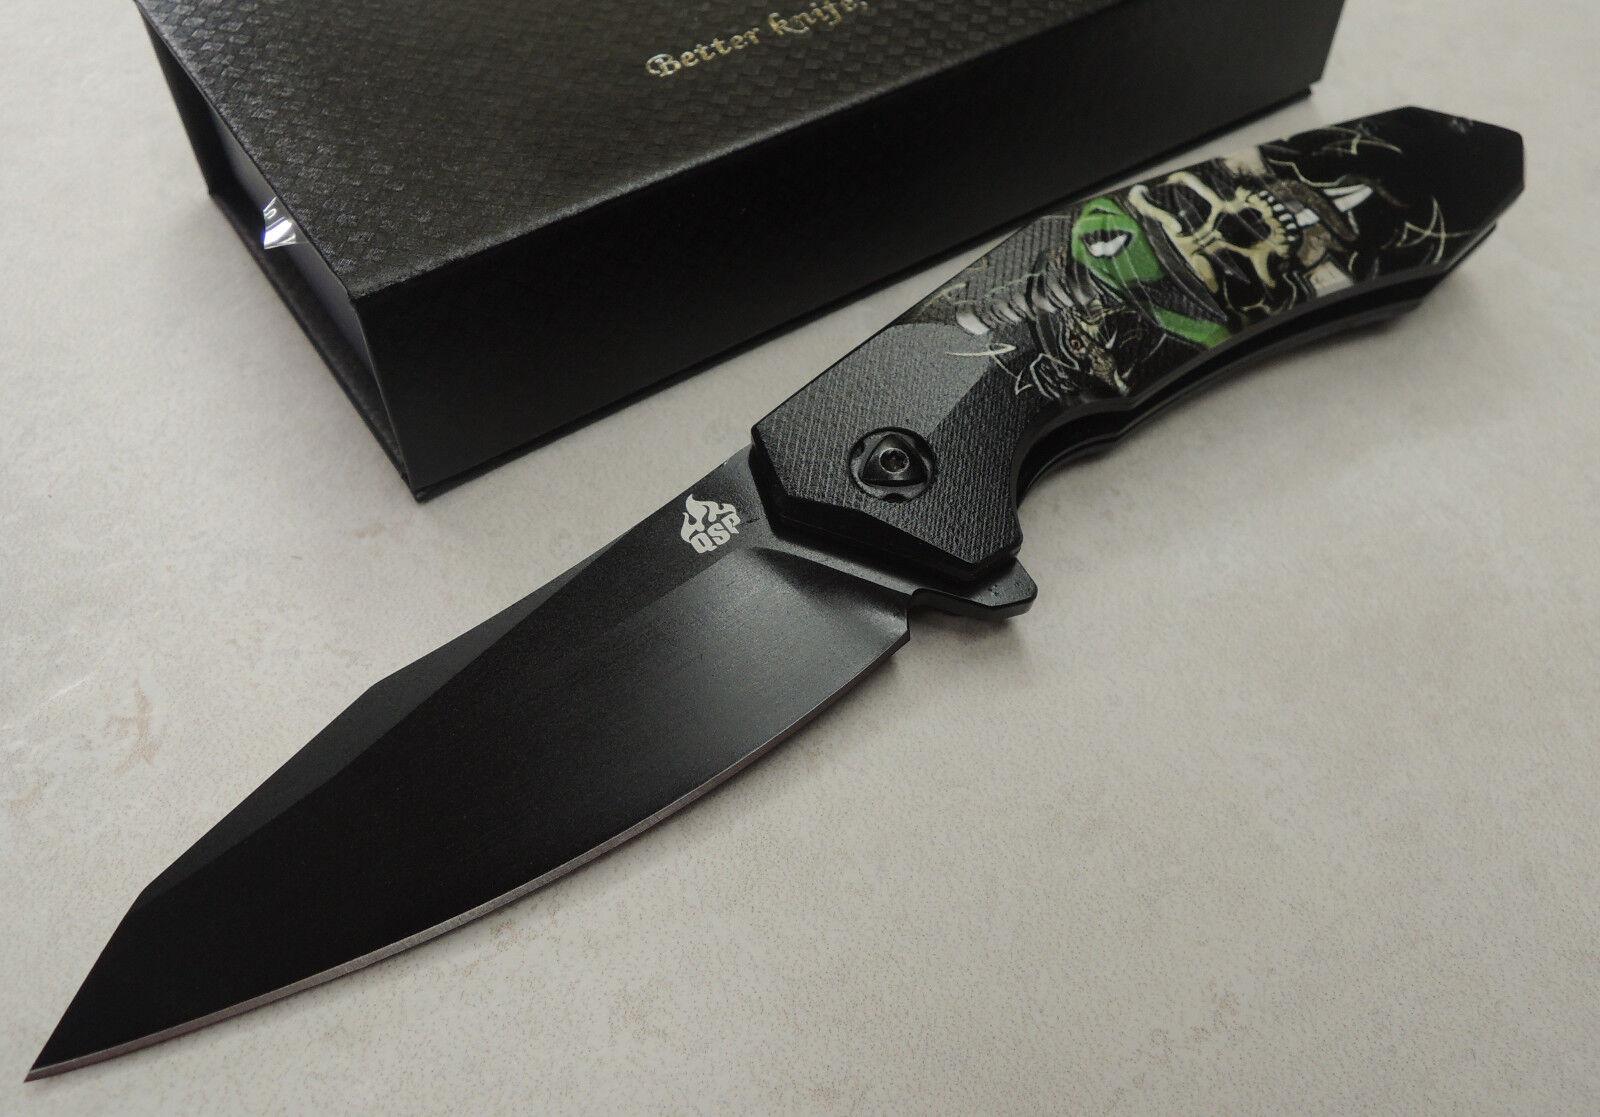 QSP QSP QSP Knives   GHOST   Taschenmesser 440C Stahl Kugellager G10 Griff QS104A 55e374